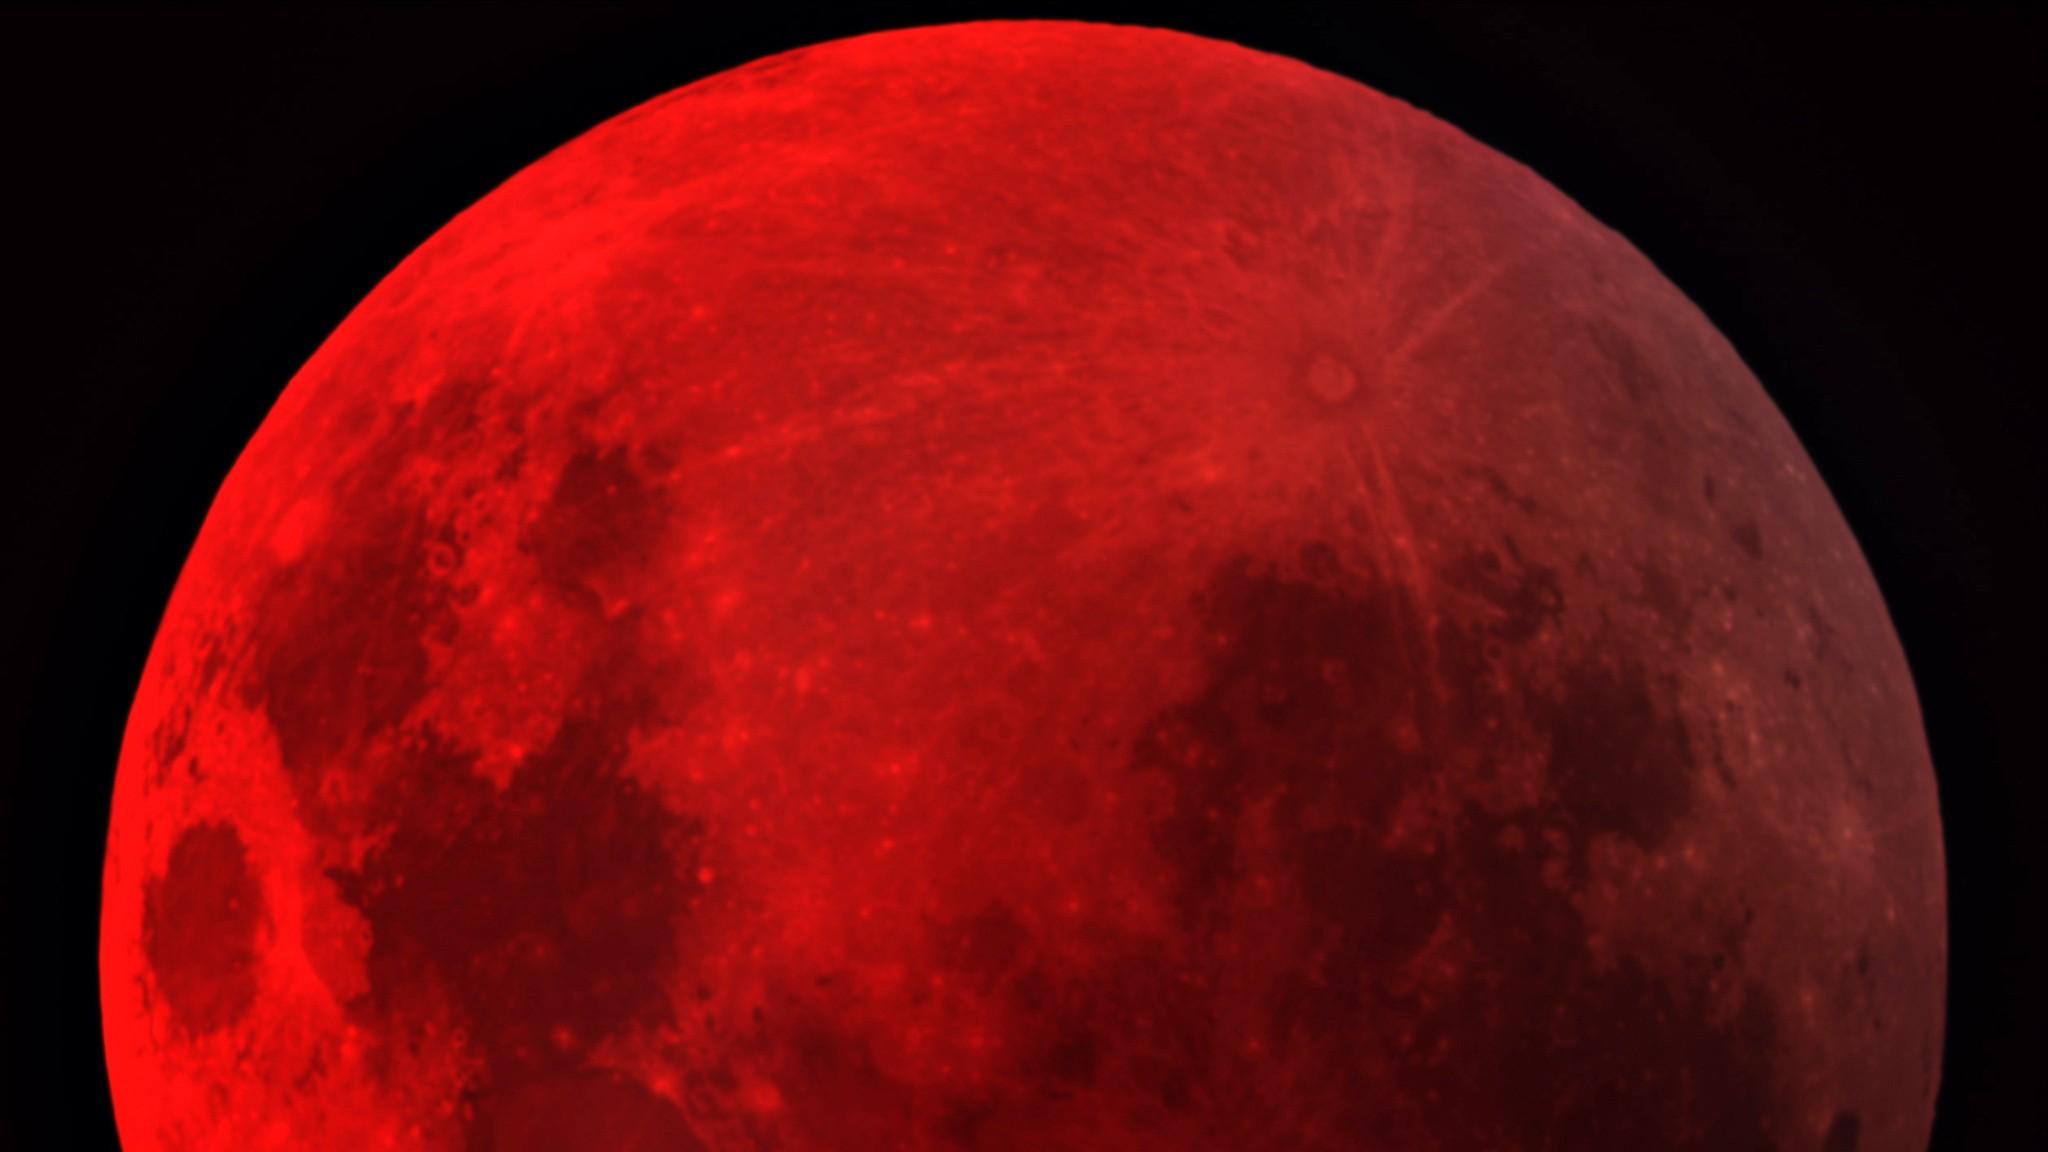 Blood Moon Wallpaper HD - WallpaperSafari